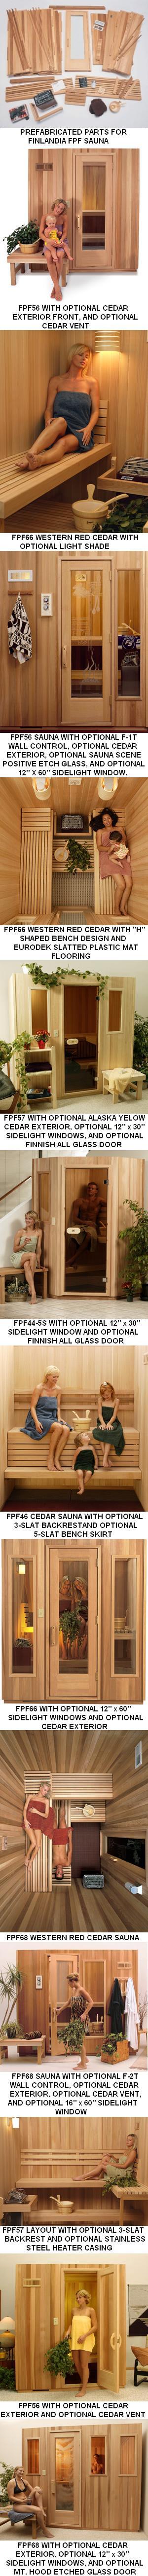 Finlandia Prefabricated Rooms (FPF)